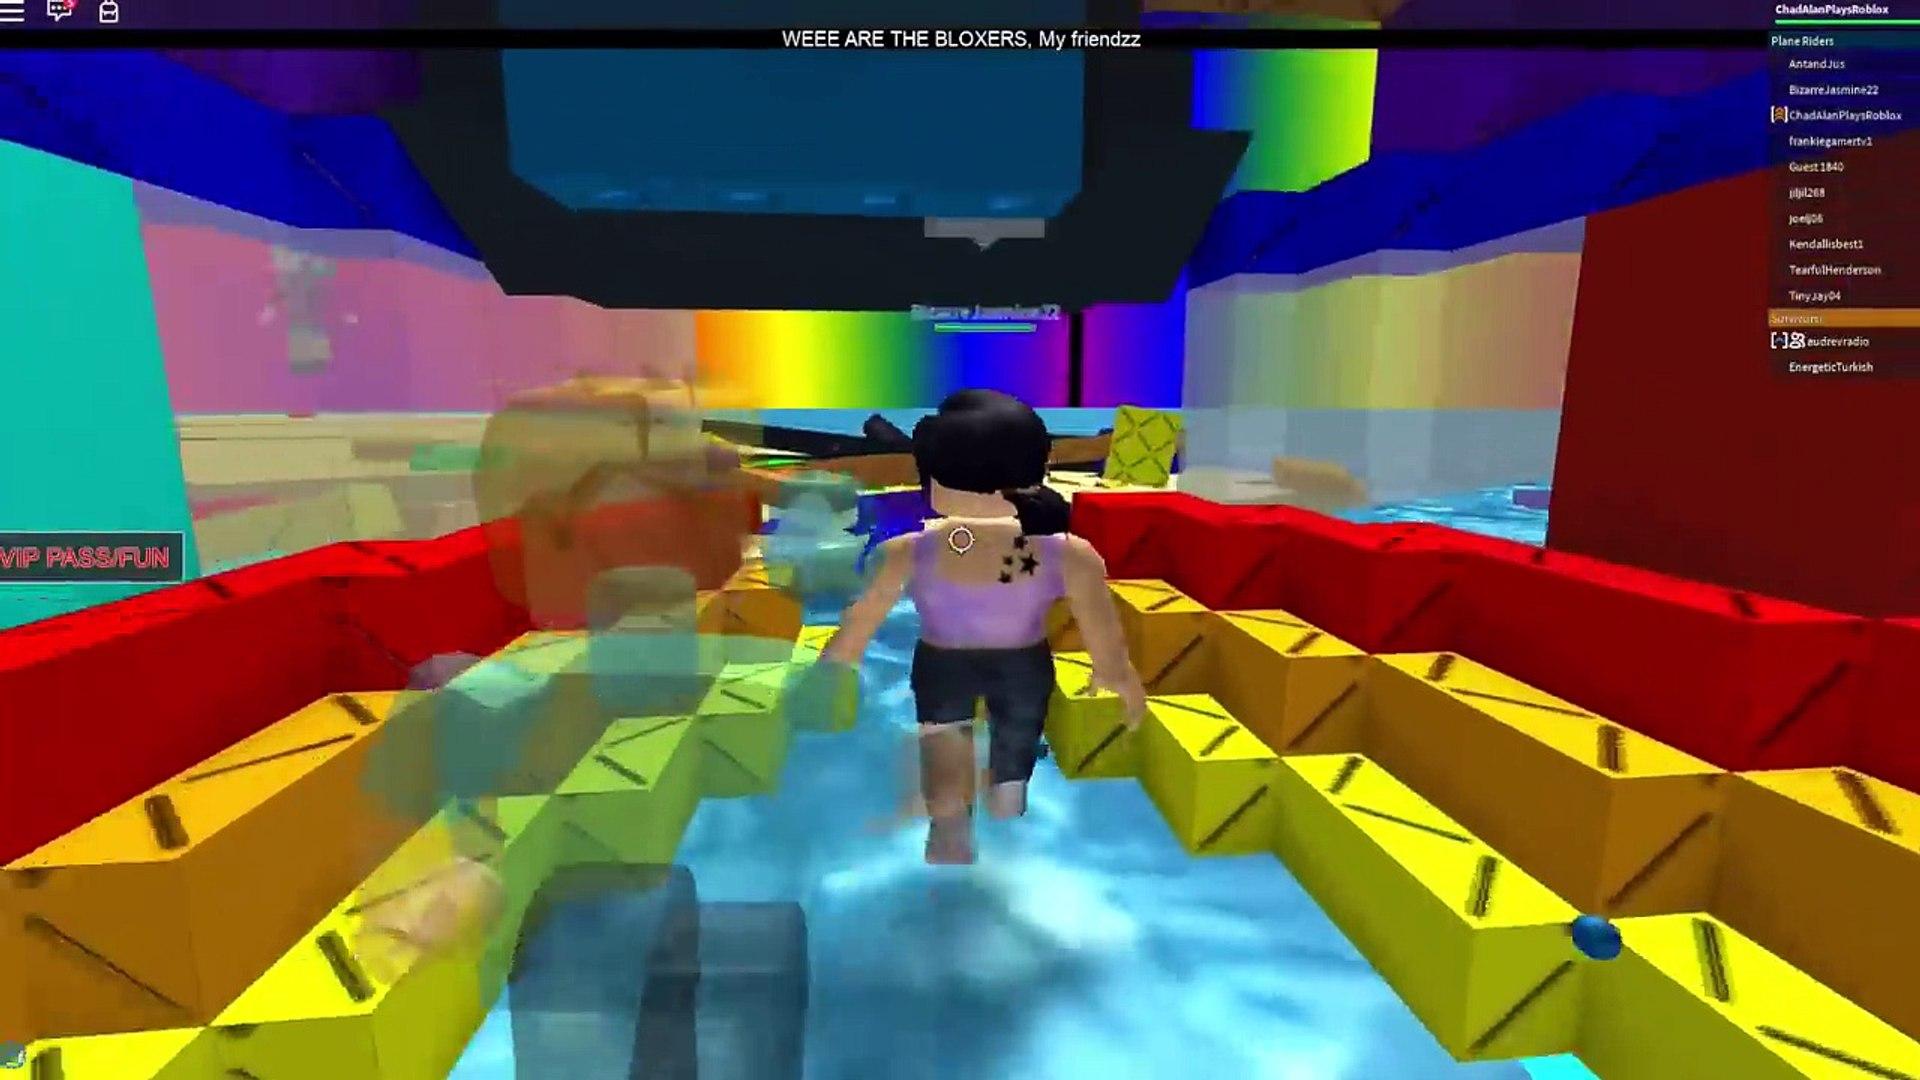 Roblox Insane Rainbow Plane Crash Survival Gamer Chad Plays - gamer chad roblox videos